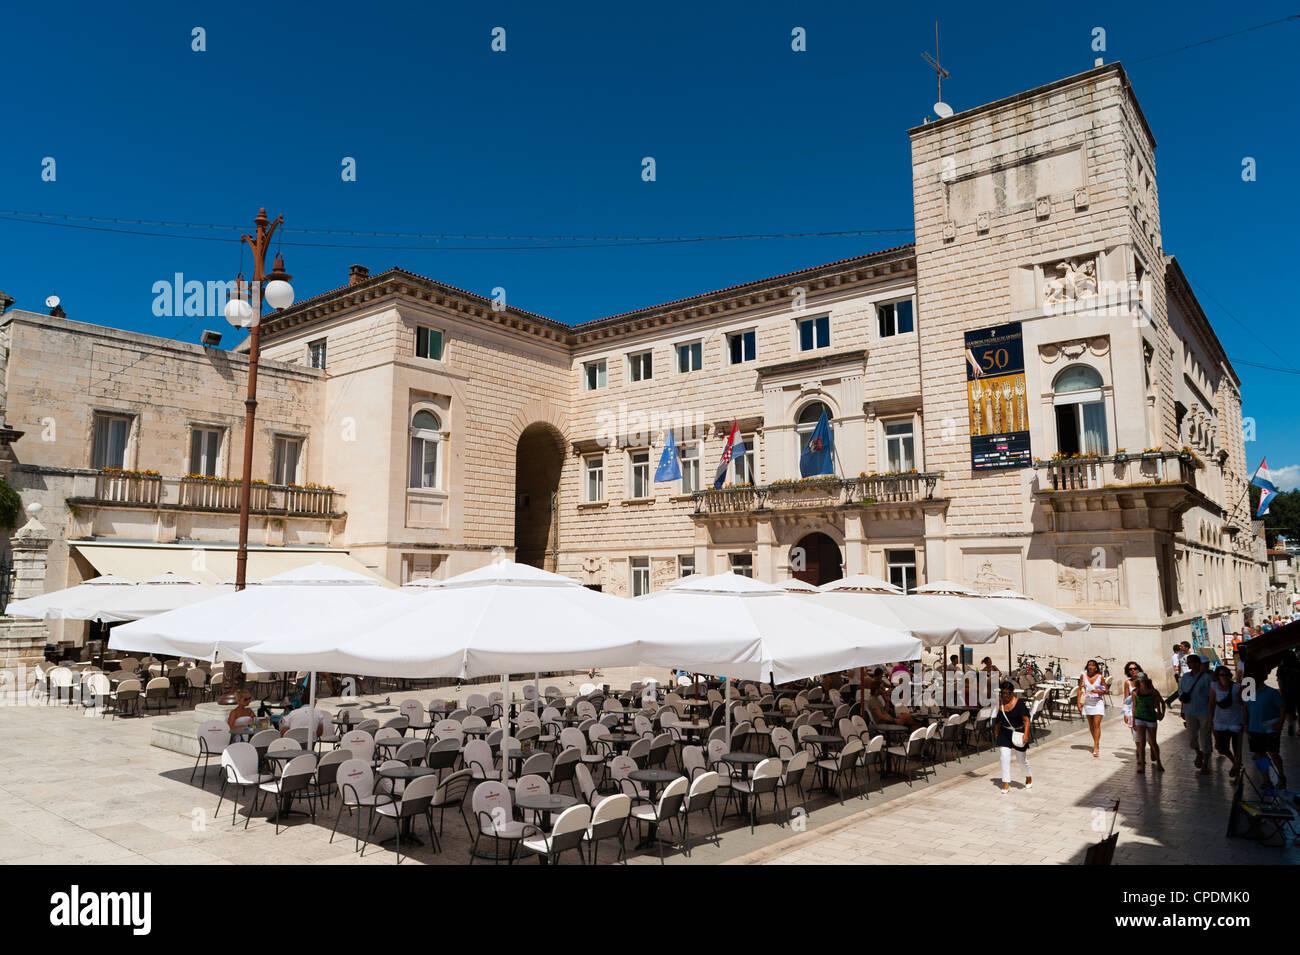 Nadbiskupski graditeljski sklop (Archbishop's architectural complex), Zadar county, Dalmatia region, Croatia, - Stock Image